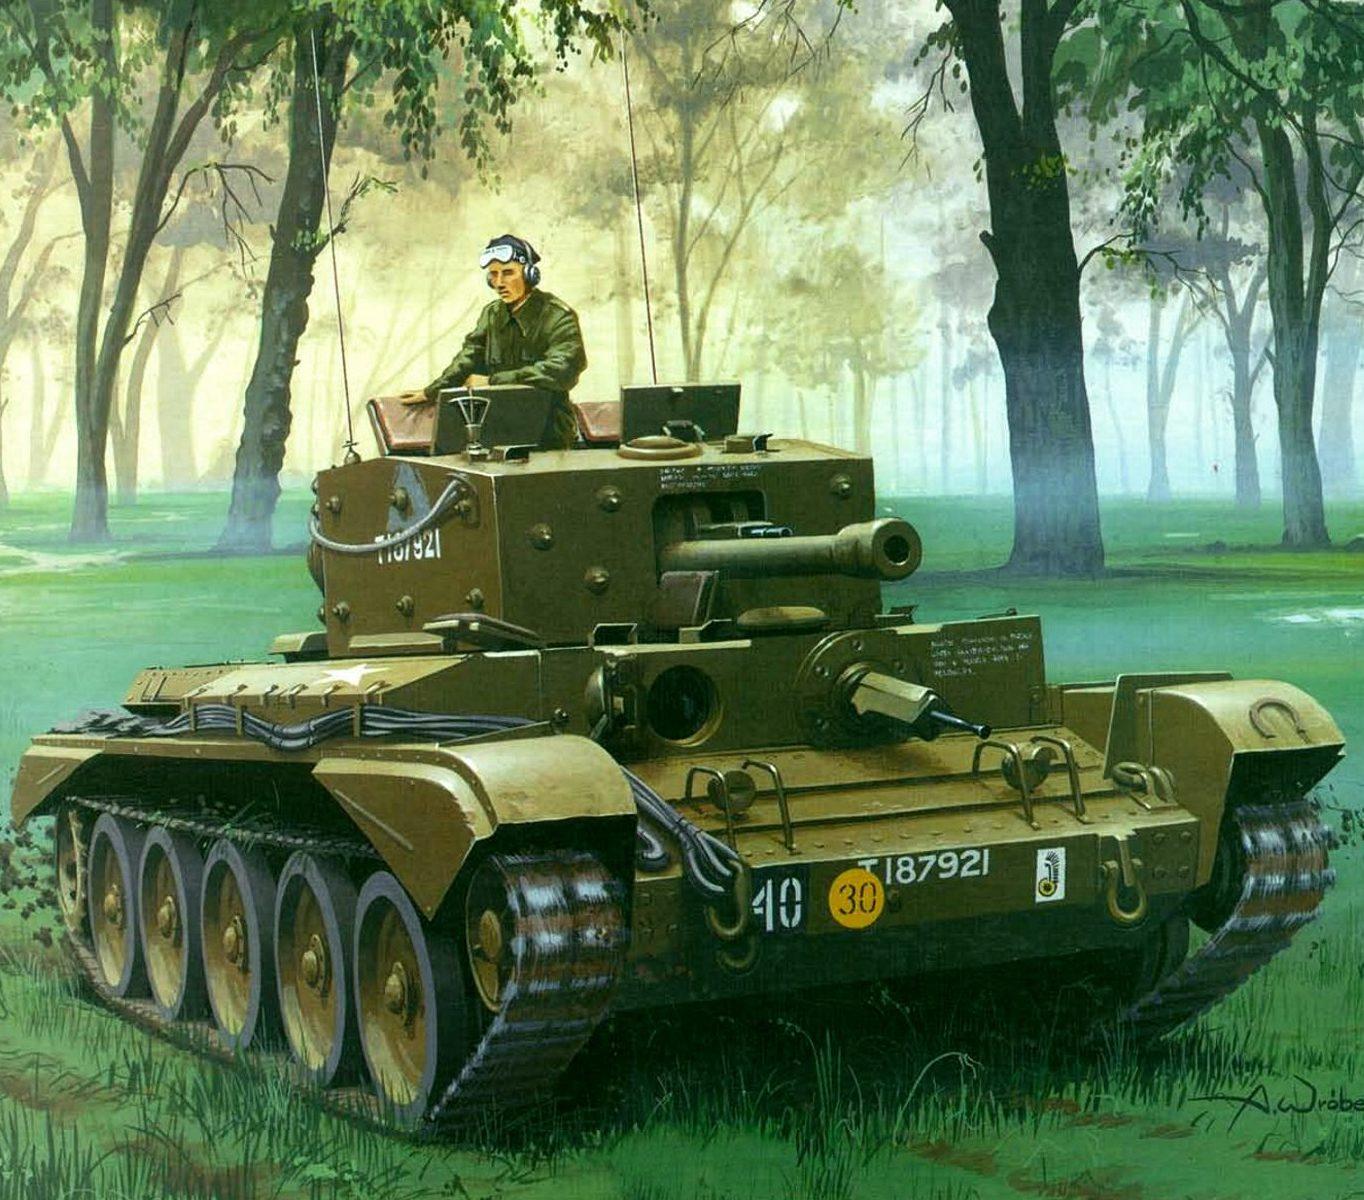 Wróbel Arkadiusz. Танк A-27M Cromwell Mk.IV.